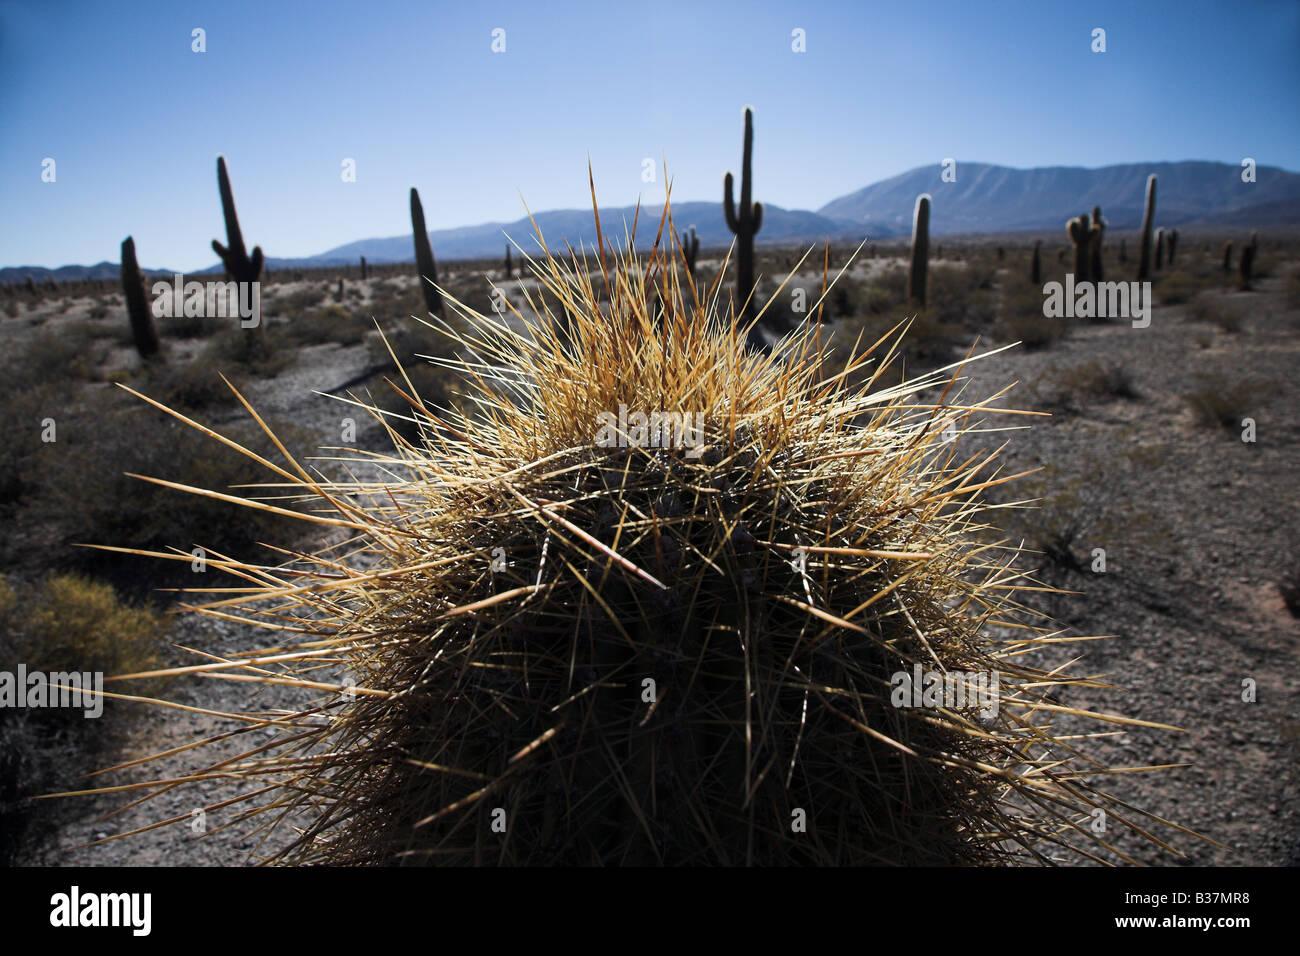 Cactus nel Parque Nacionale de Cardones a Salta Arentina settentrionale. Immagini Stock